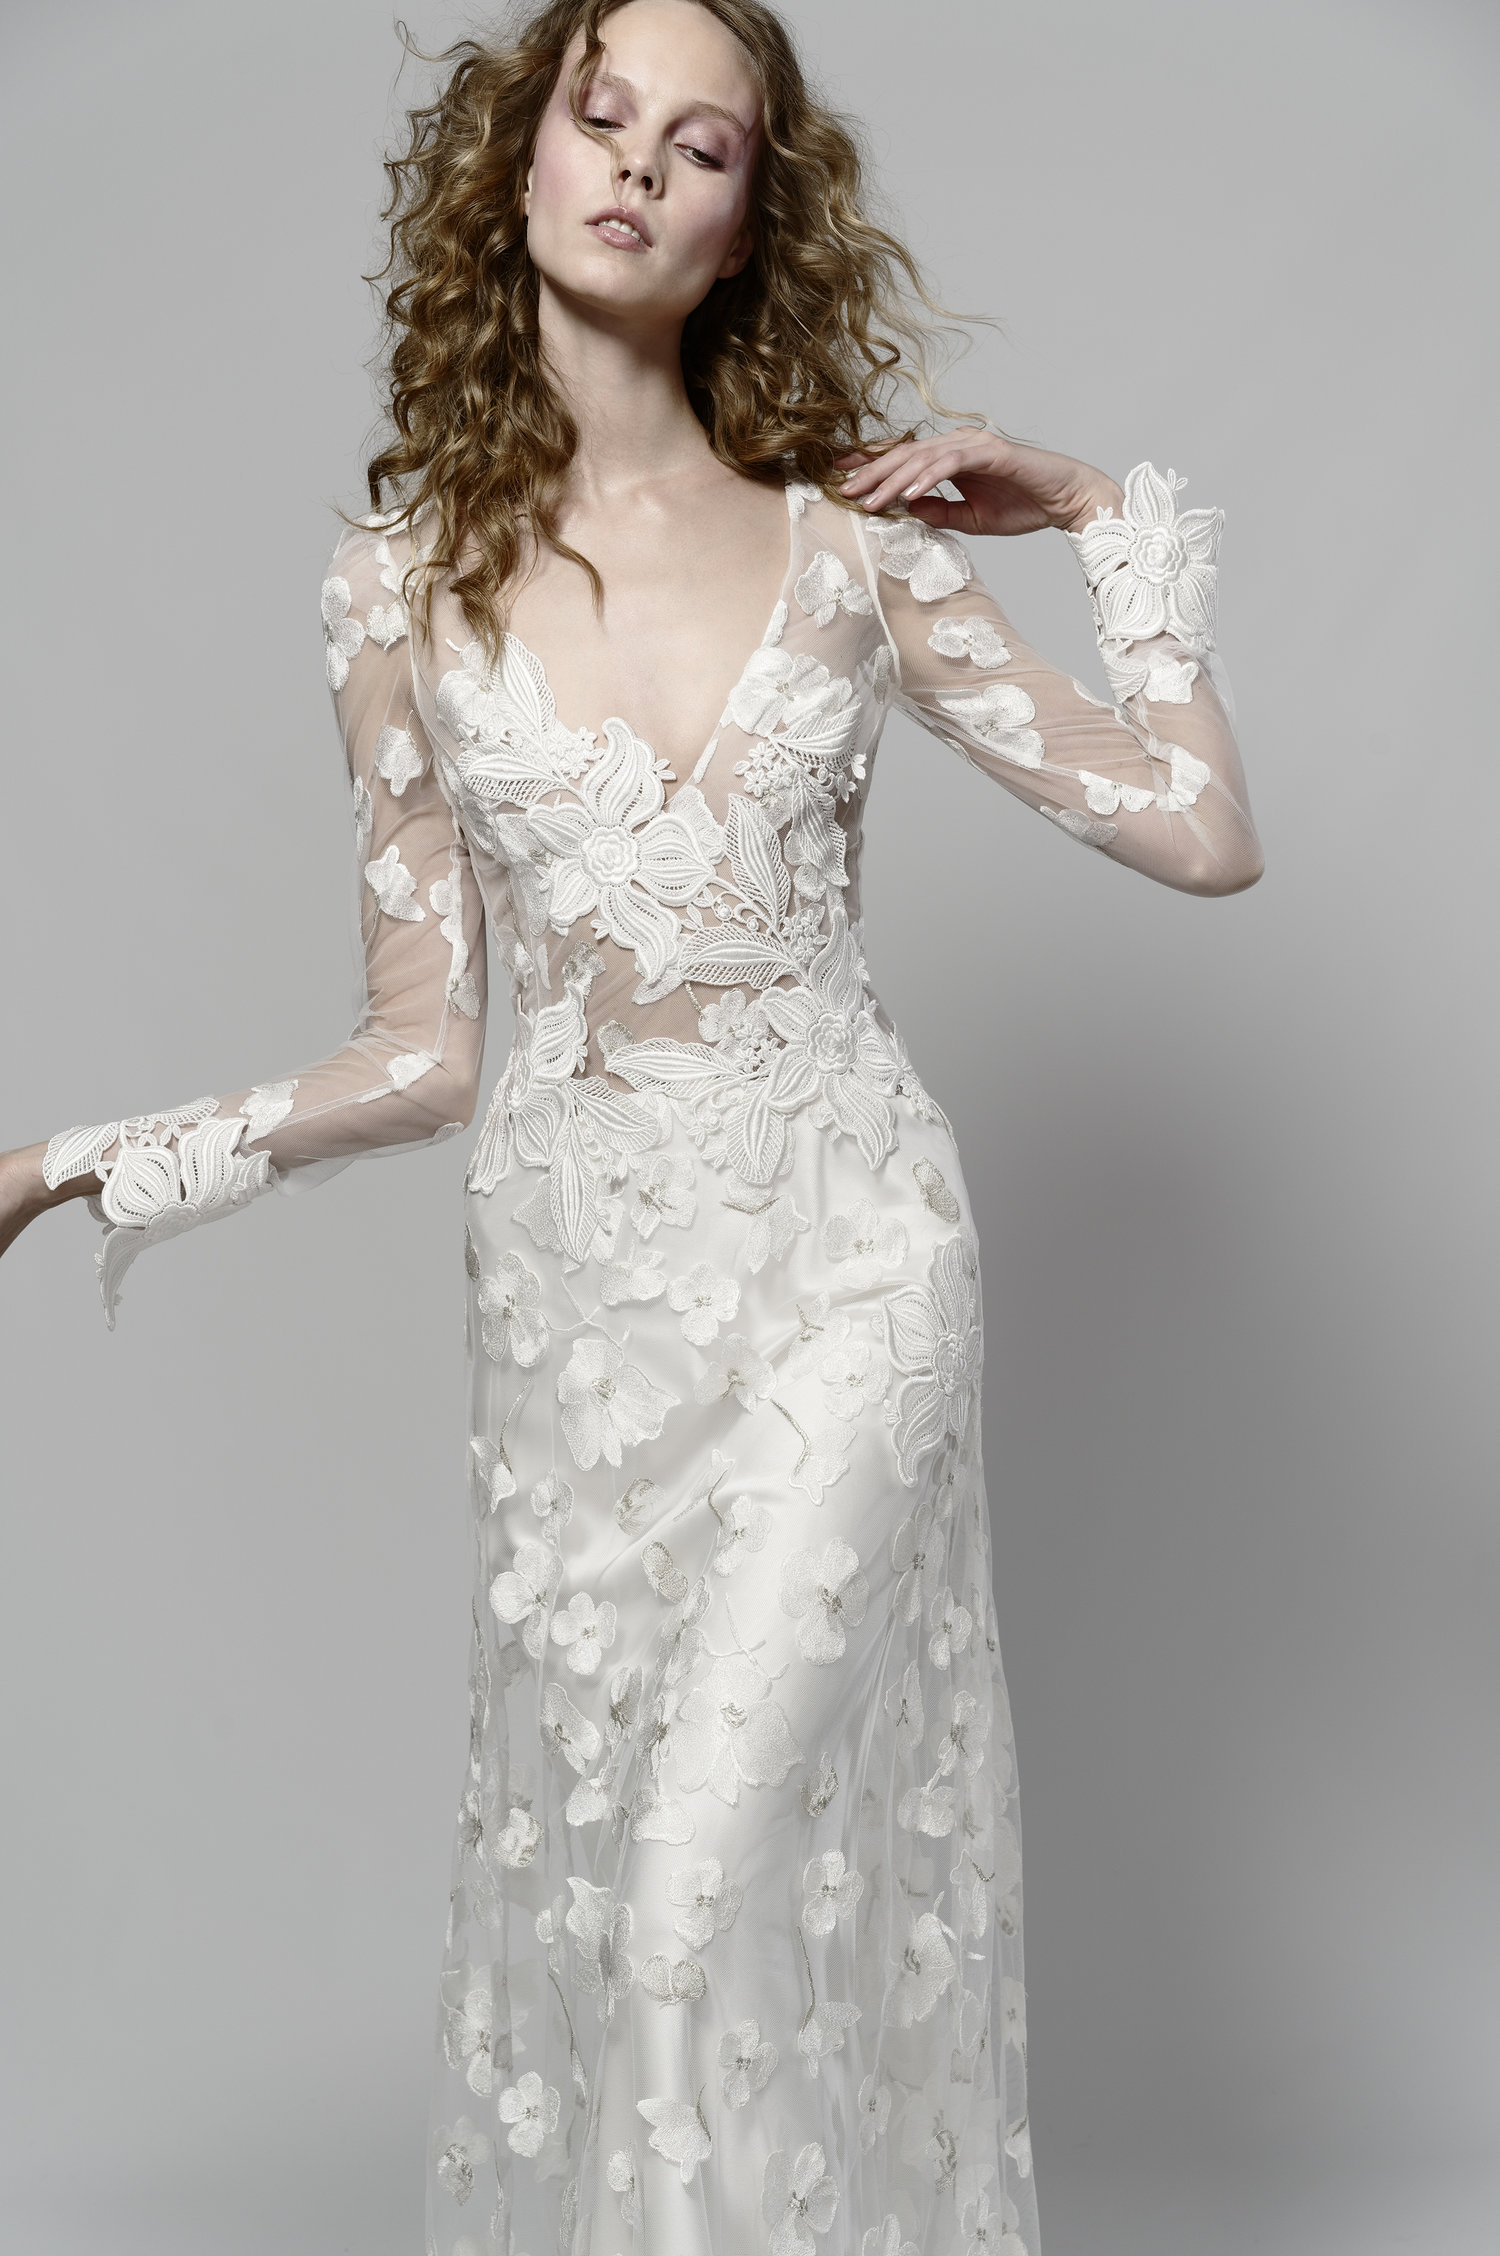 Neiman Marcus Dallas Trunk Show Elizabeth Fillmore Bridal,Midi Wedding Guest Dresses With Sleeves